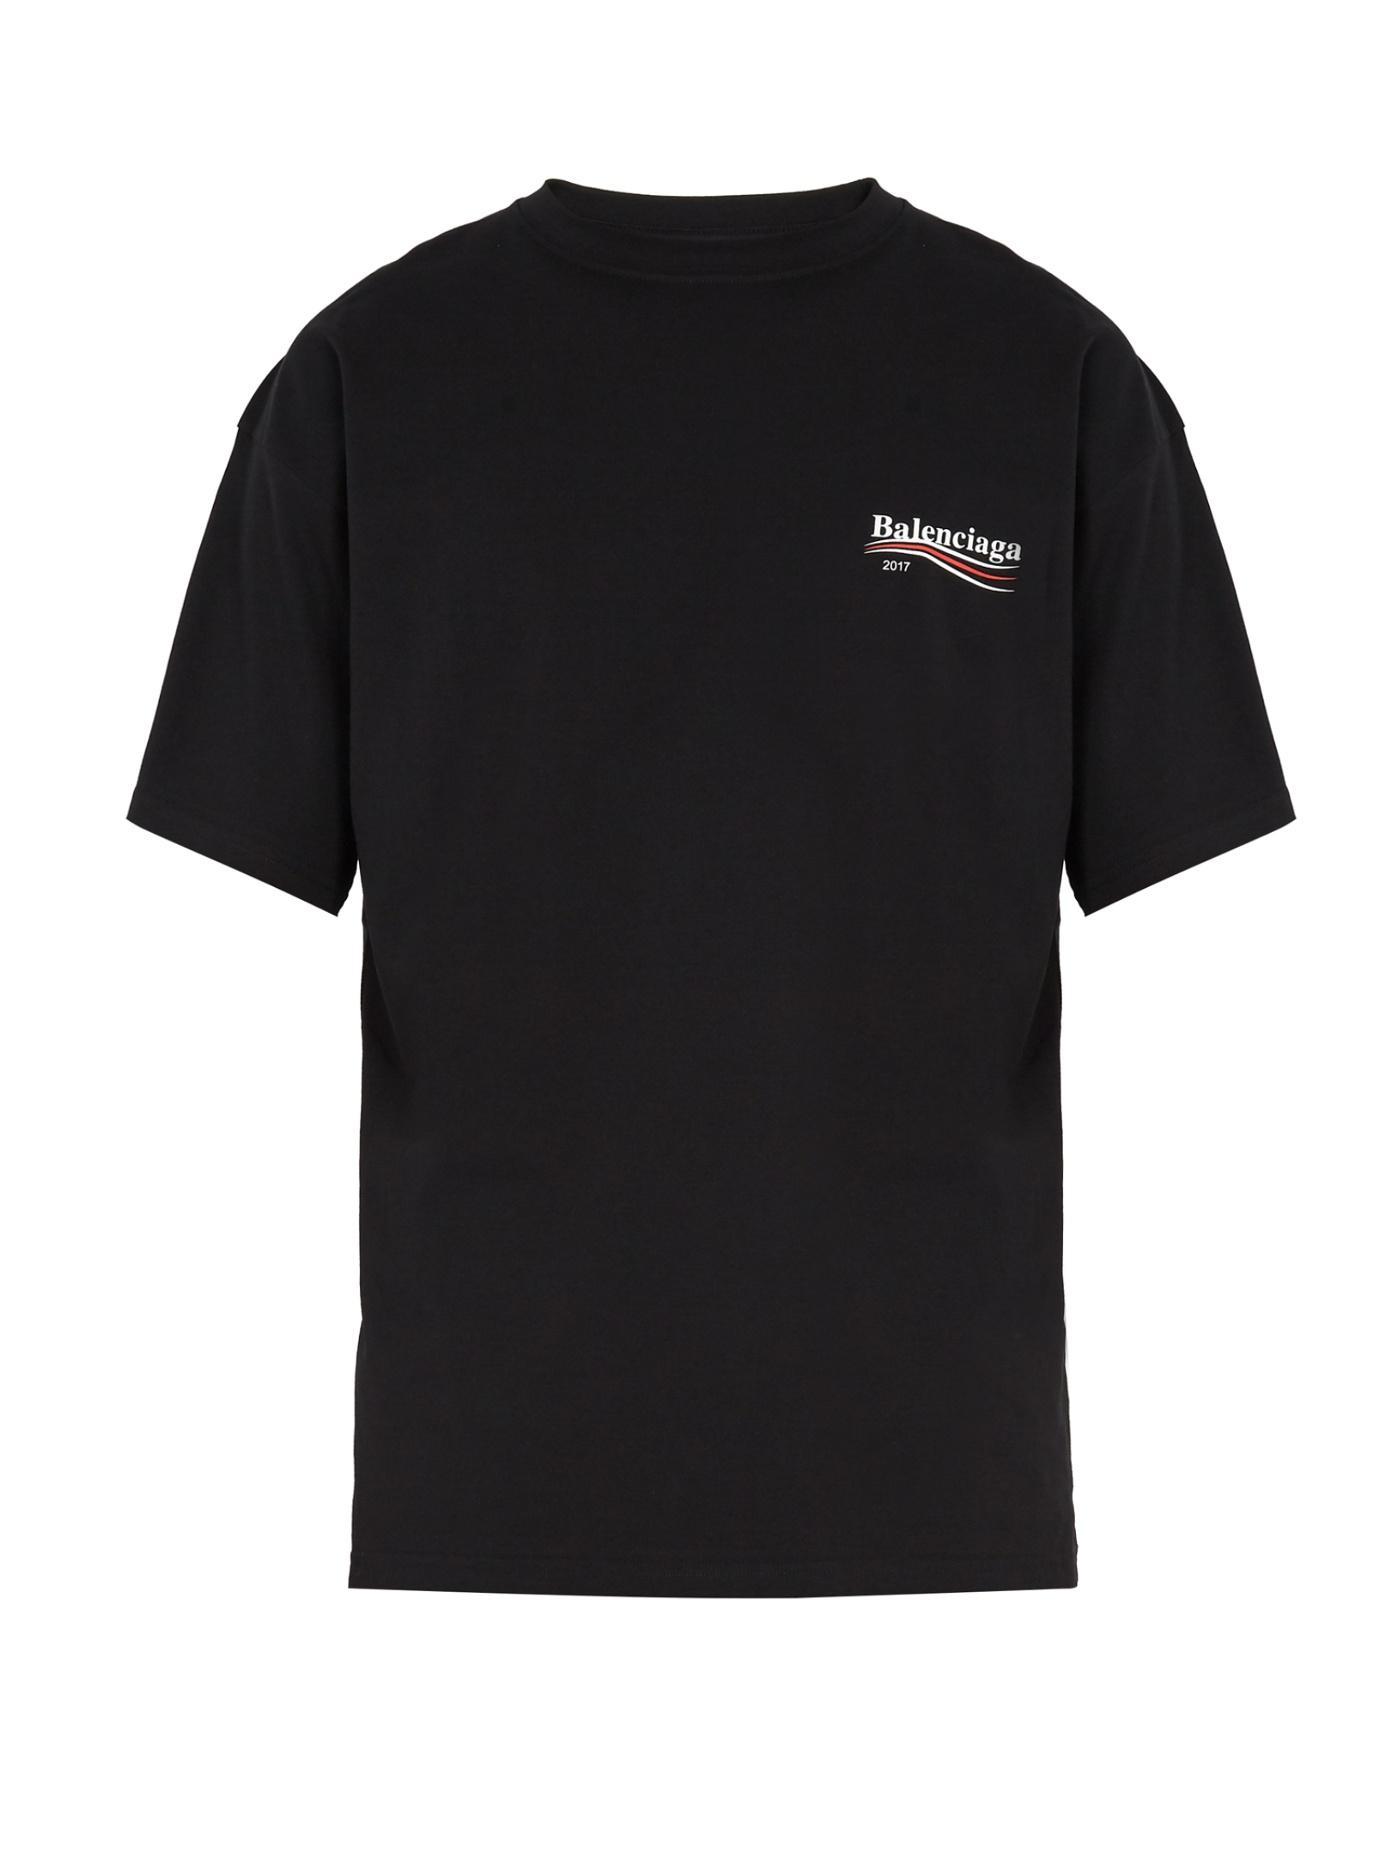 913cff9d632 Balenciaga Oversized Logo-Print Cotton-Jersey T-Shirt In 1000 Black ...